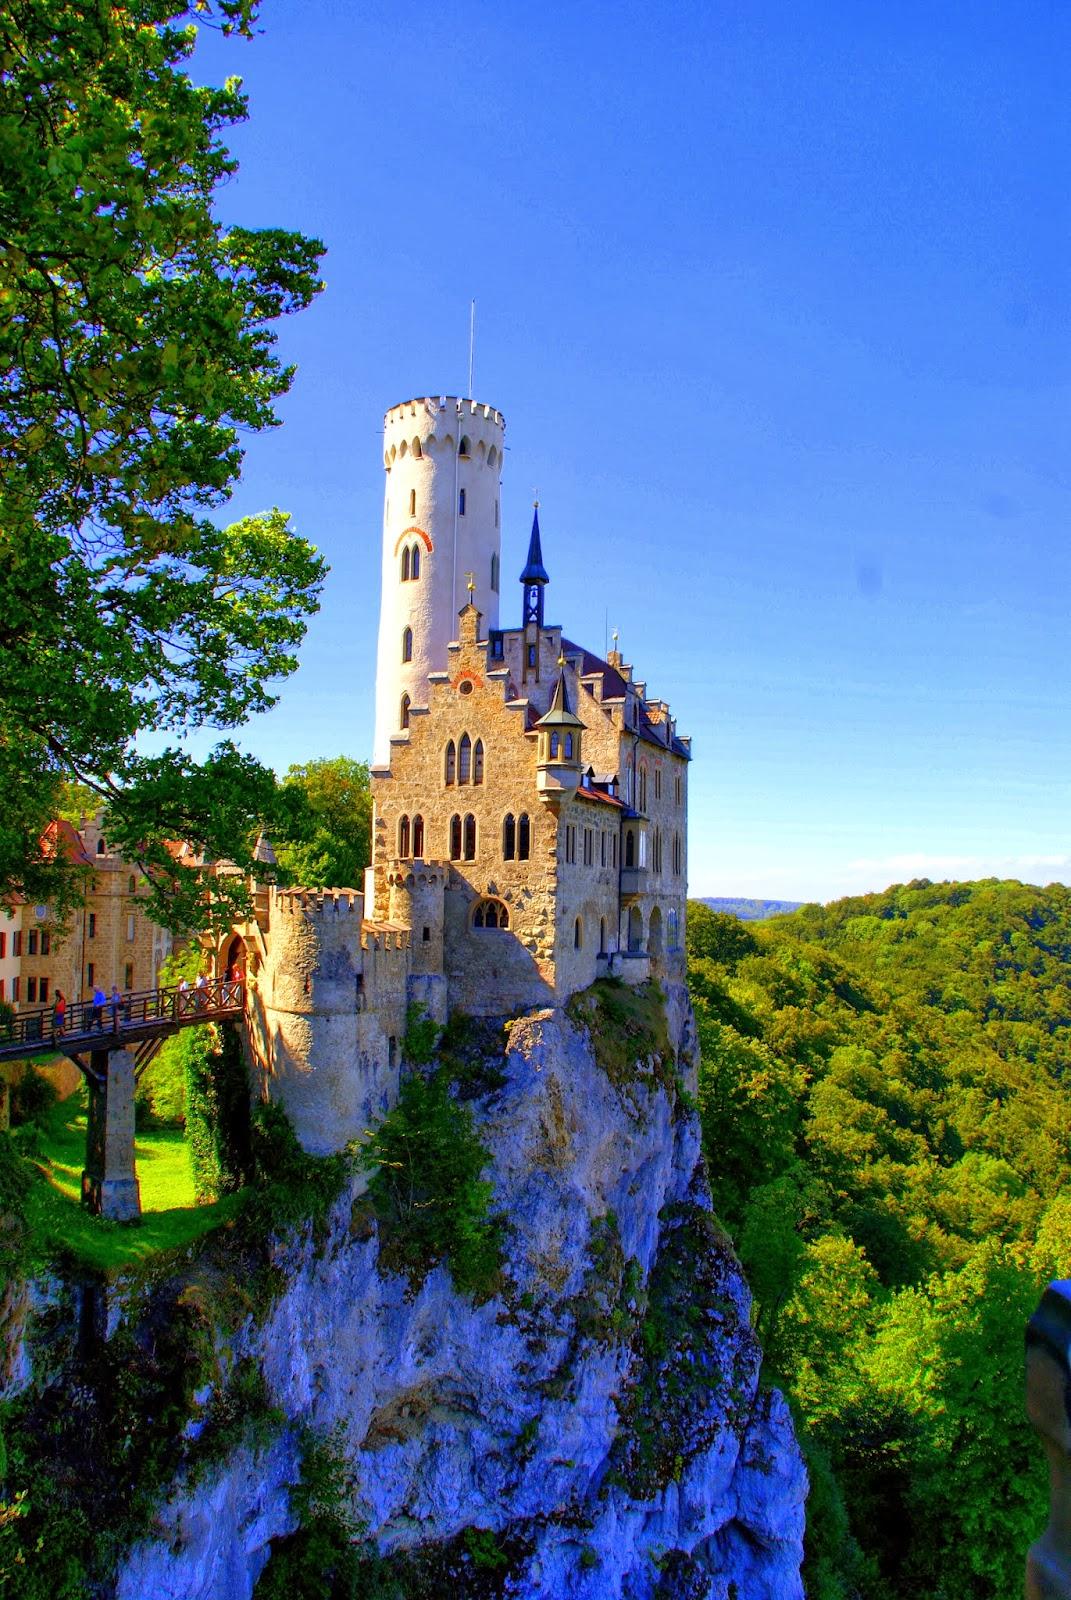 Das Dornröschenschloss